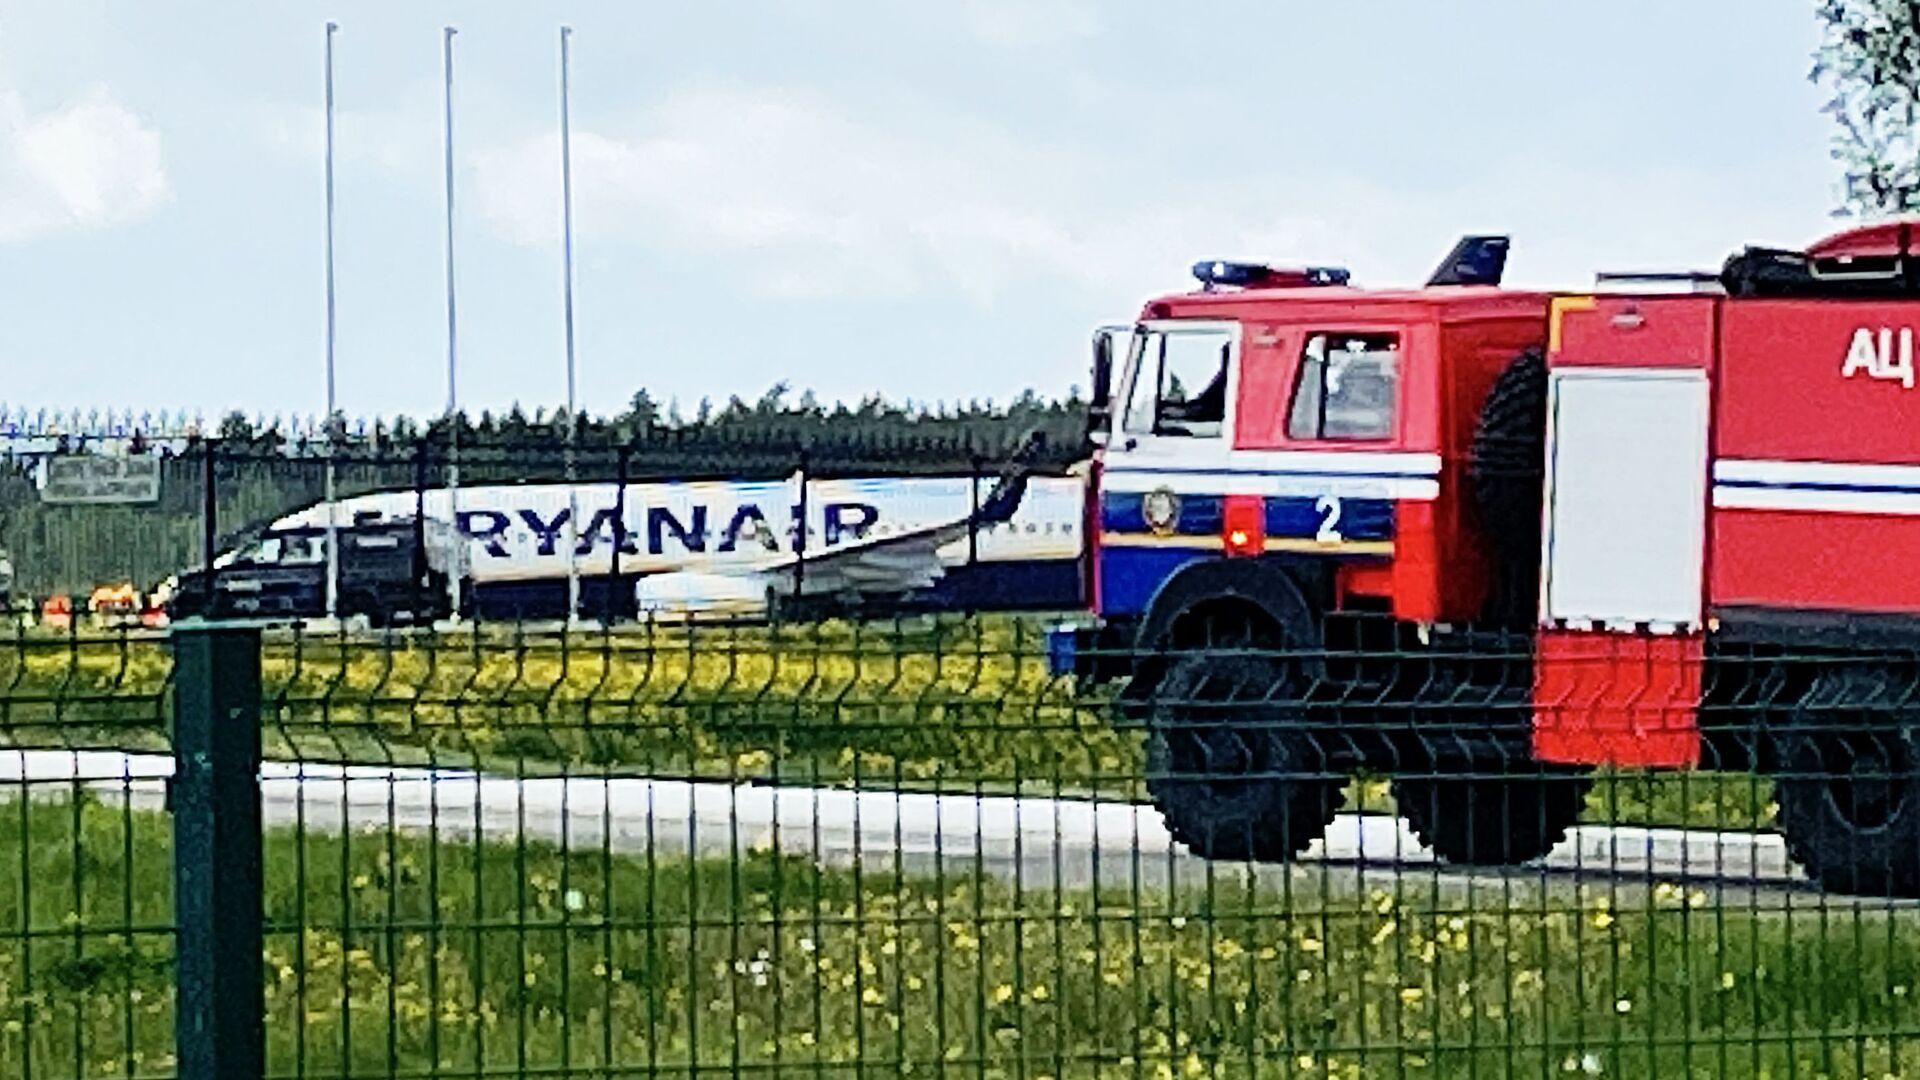 Samolot Ryanair w Mińsku - Sputnik Polska, 1920, 14.06.2021